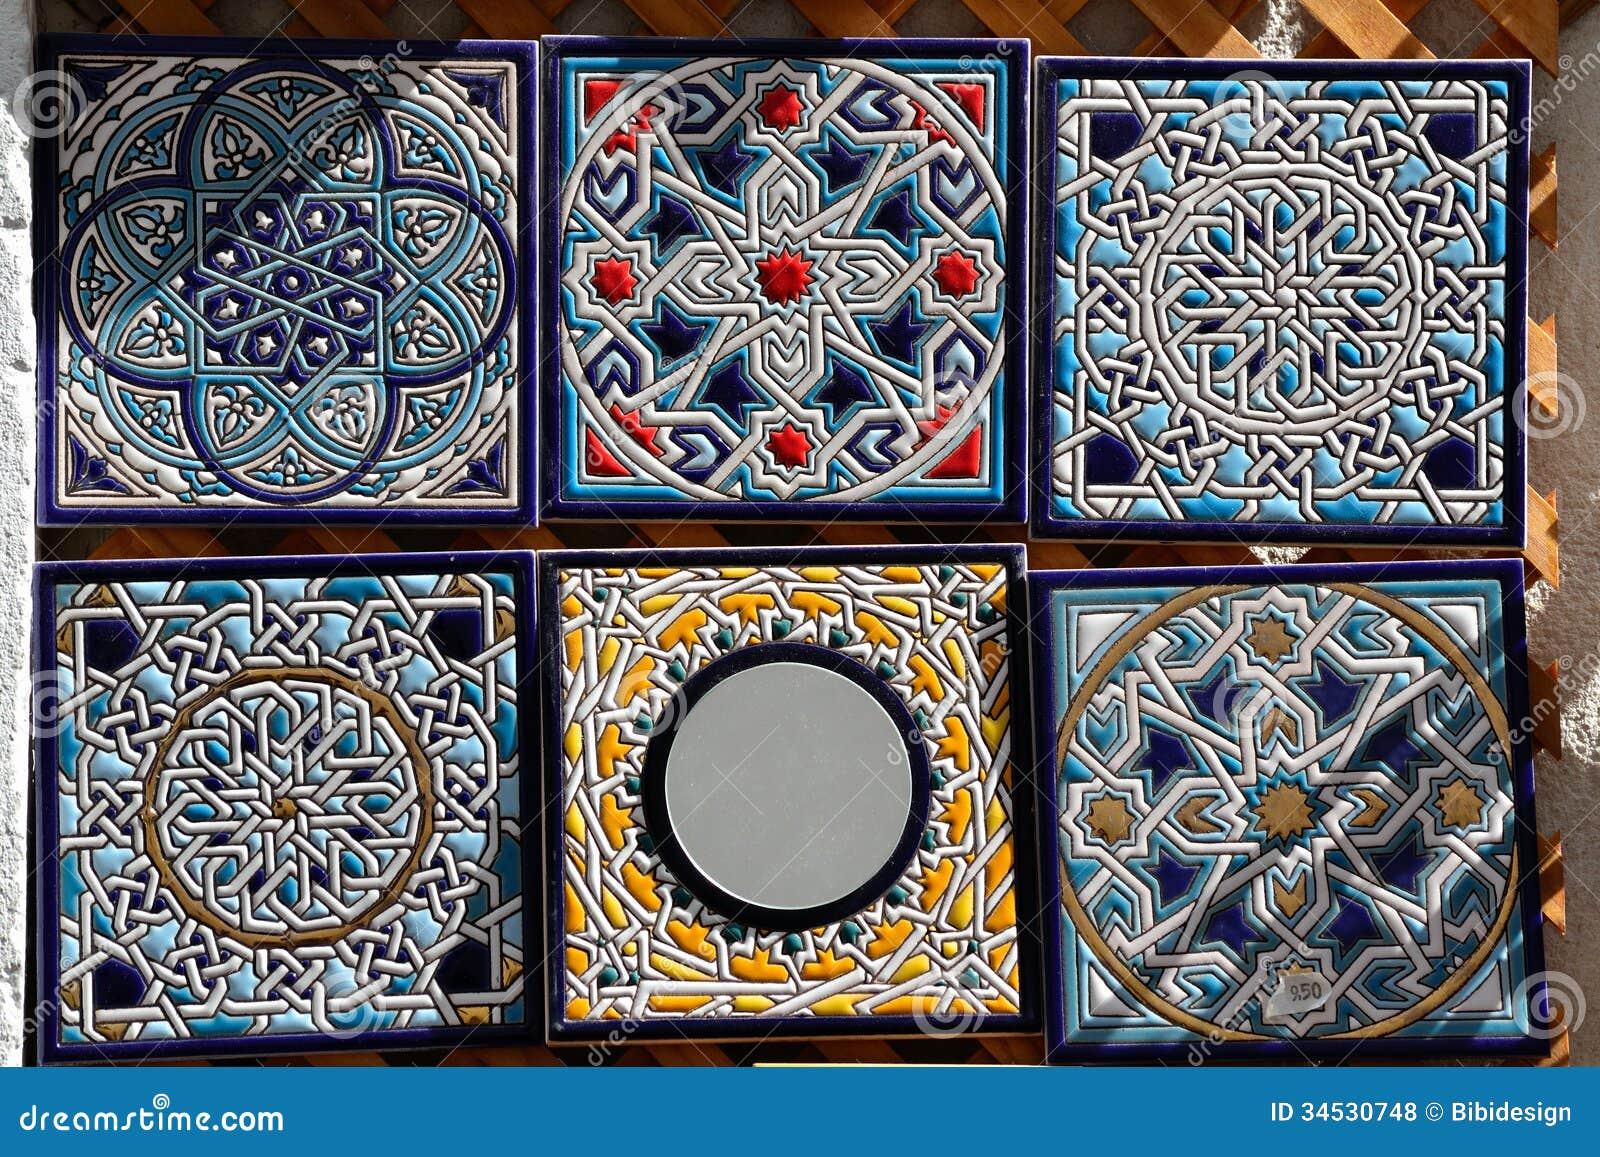 Piastrelle di ceramica dipinte a mano decorative da - Piastrelle dipinte ...